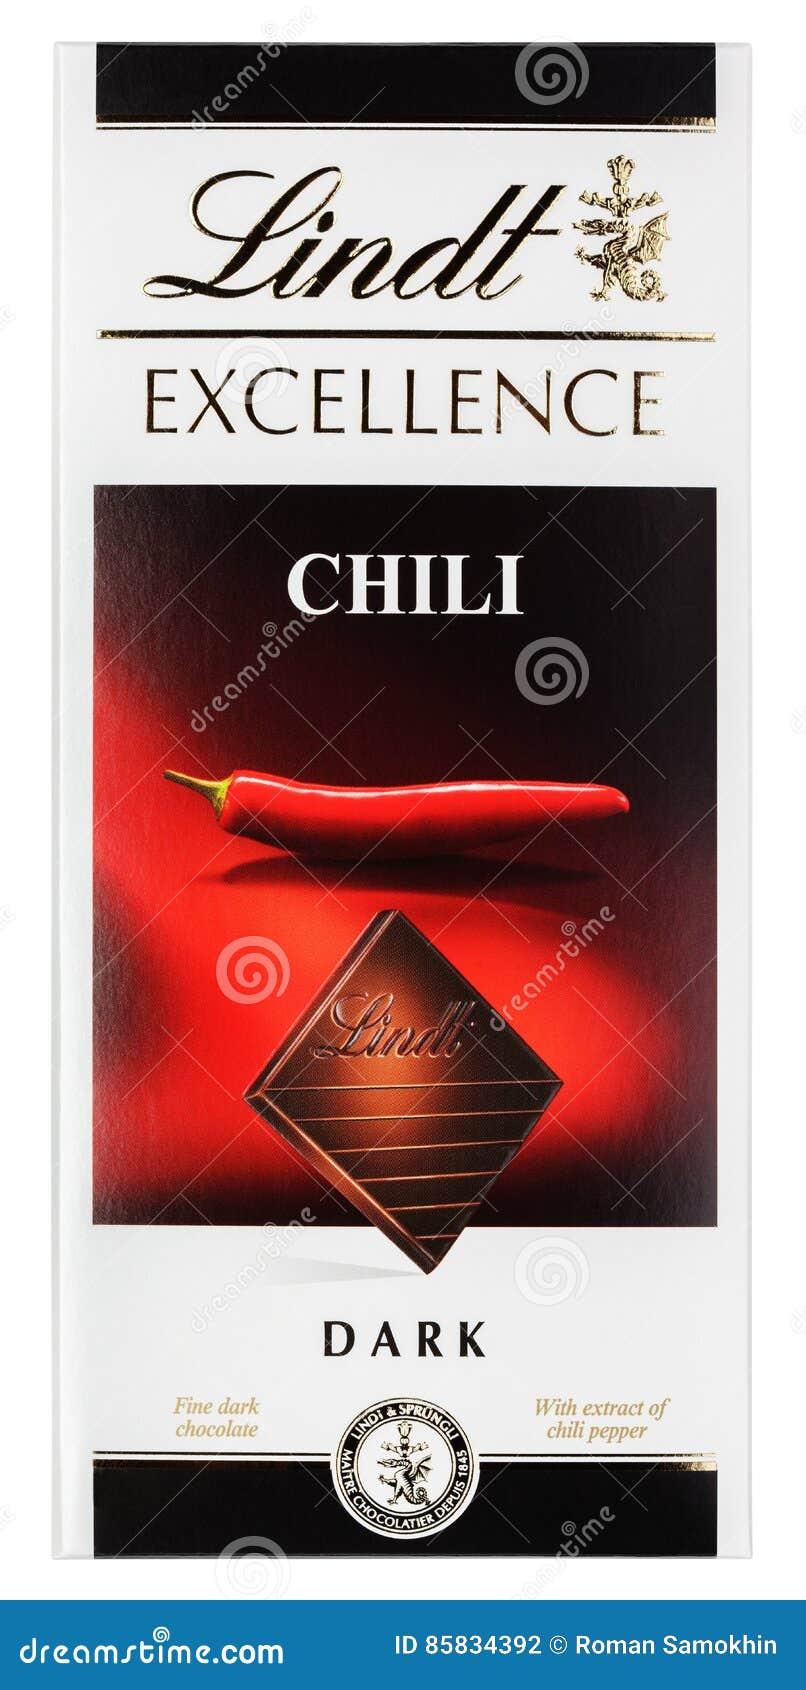 Lindt优秀辣椒瑞士黑暗的巧克力块顶视图在白色隔绝的